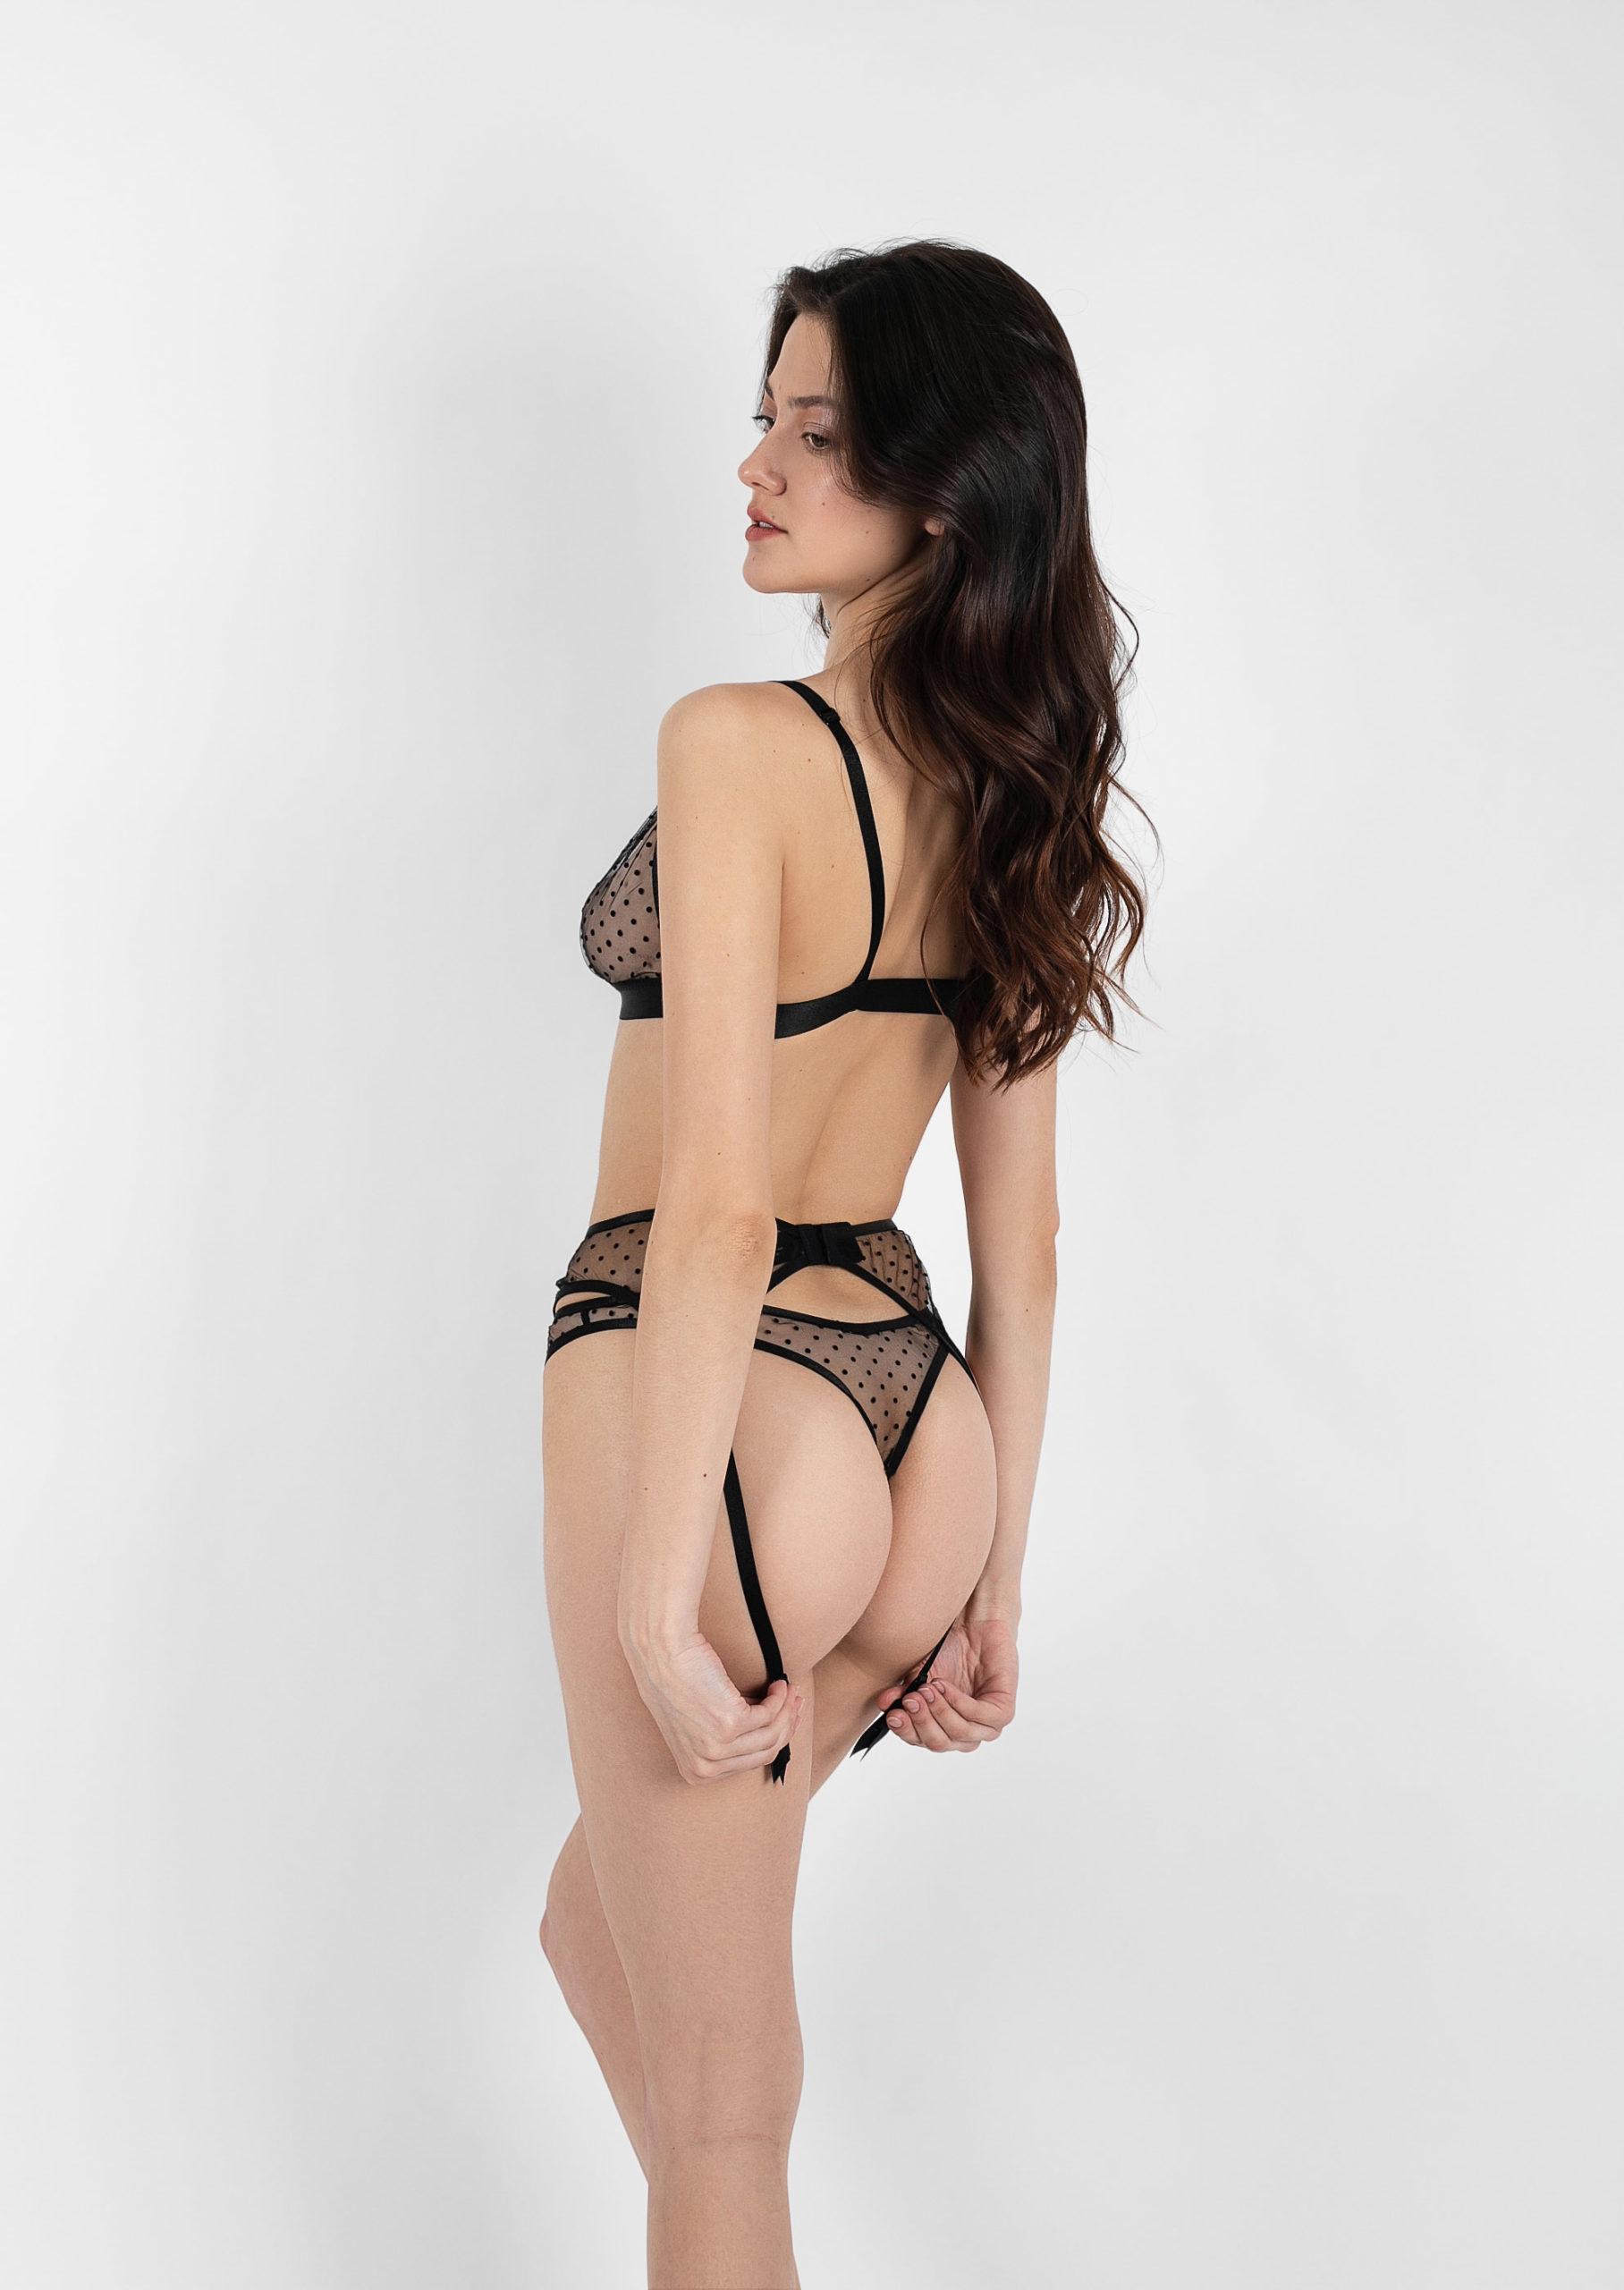 Flirt lingerie set / сlear black lingerie with polka dot with garter belt / sexy transparent lingerie / non wired bra with high waist belt